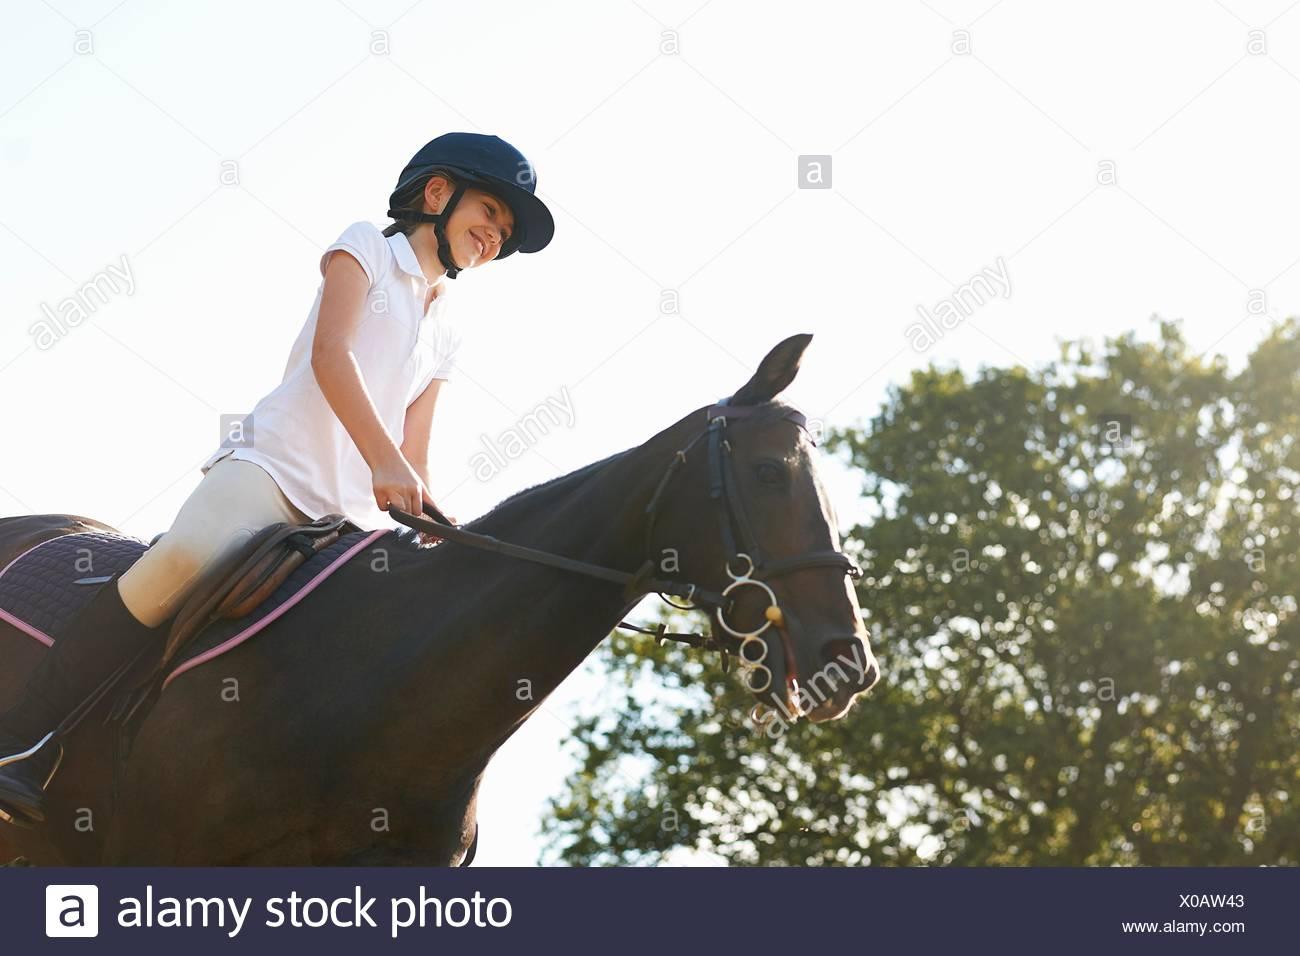 Ángulo de visión baja de chica en caballo en campo Imagen De Stock